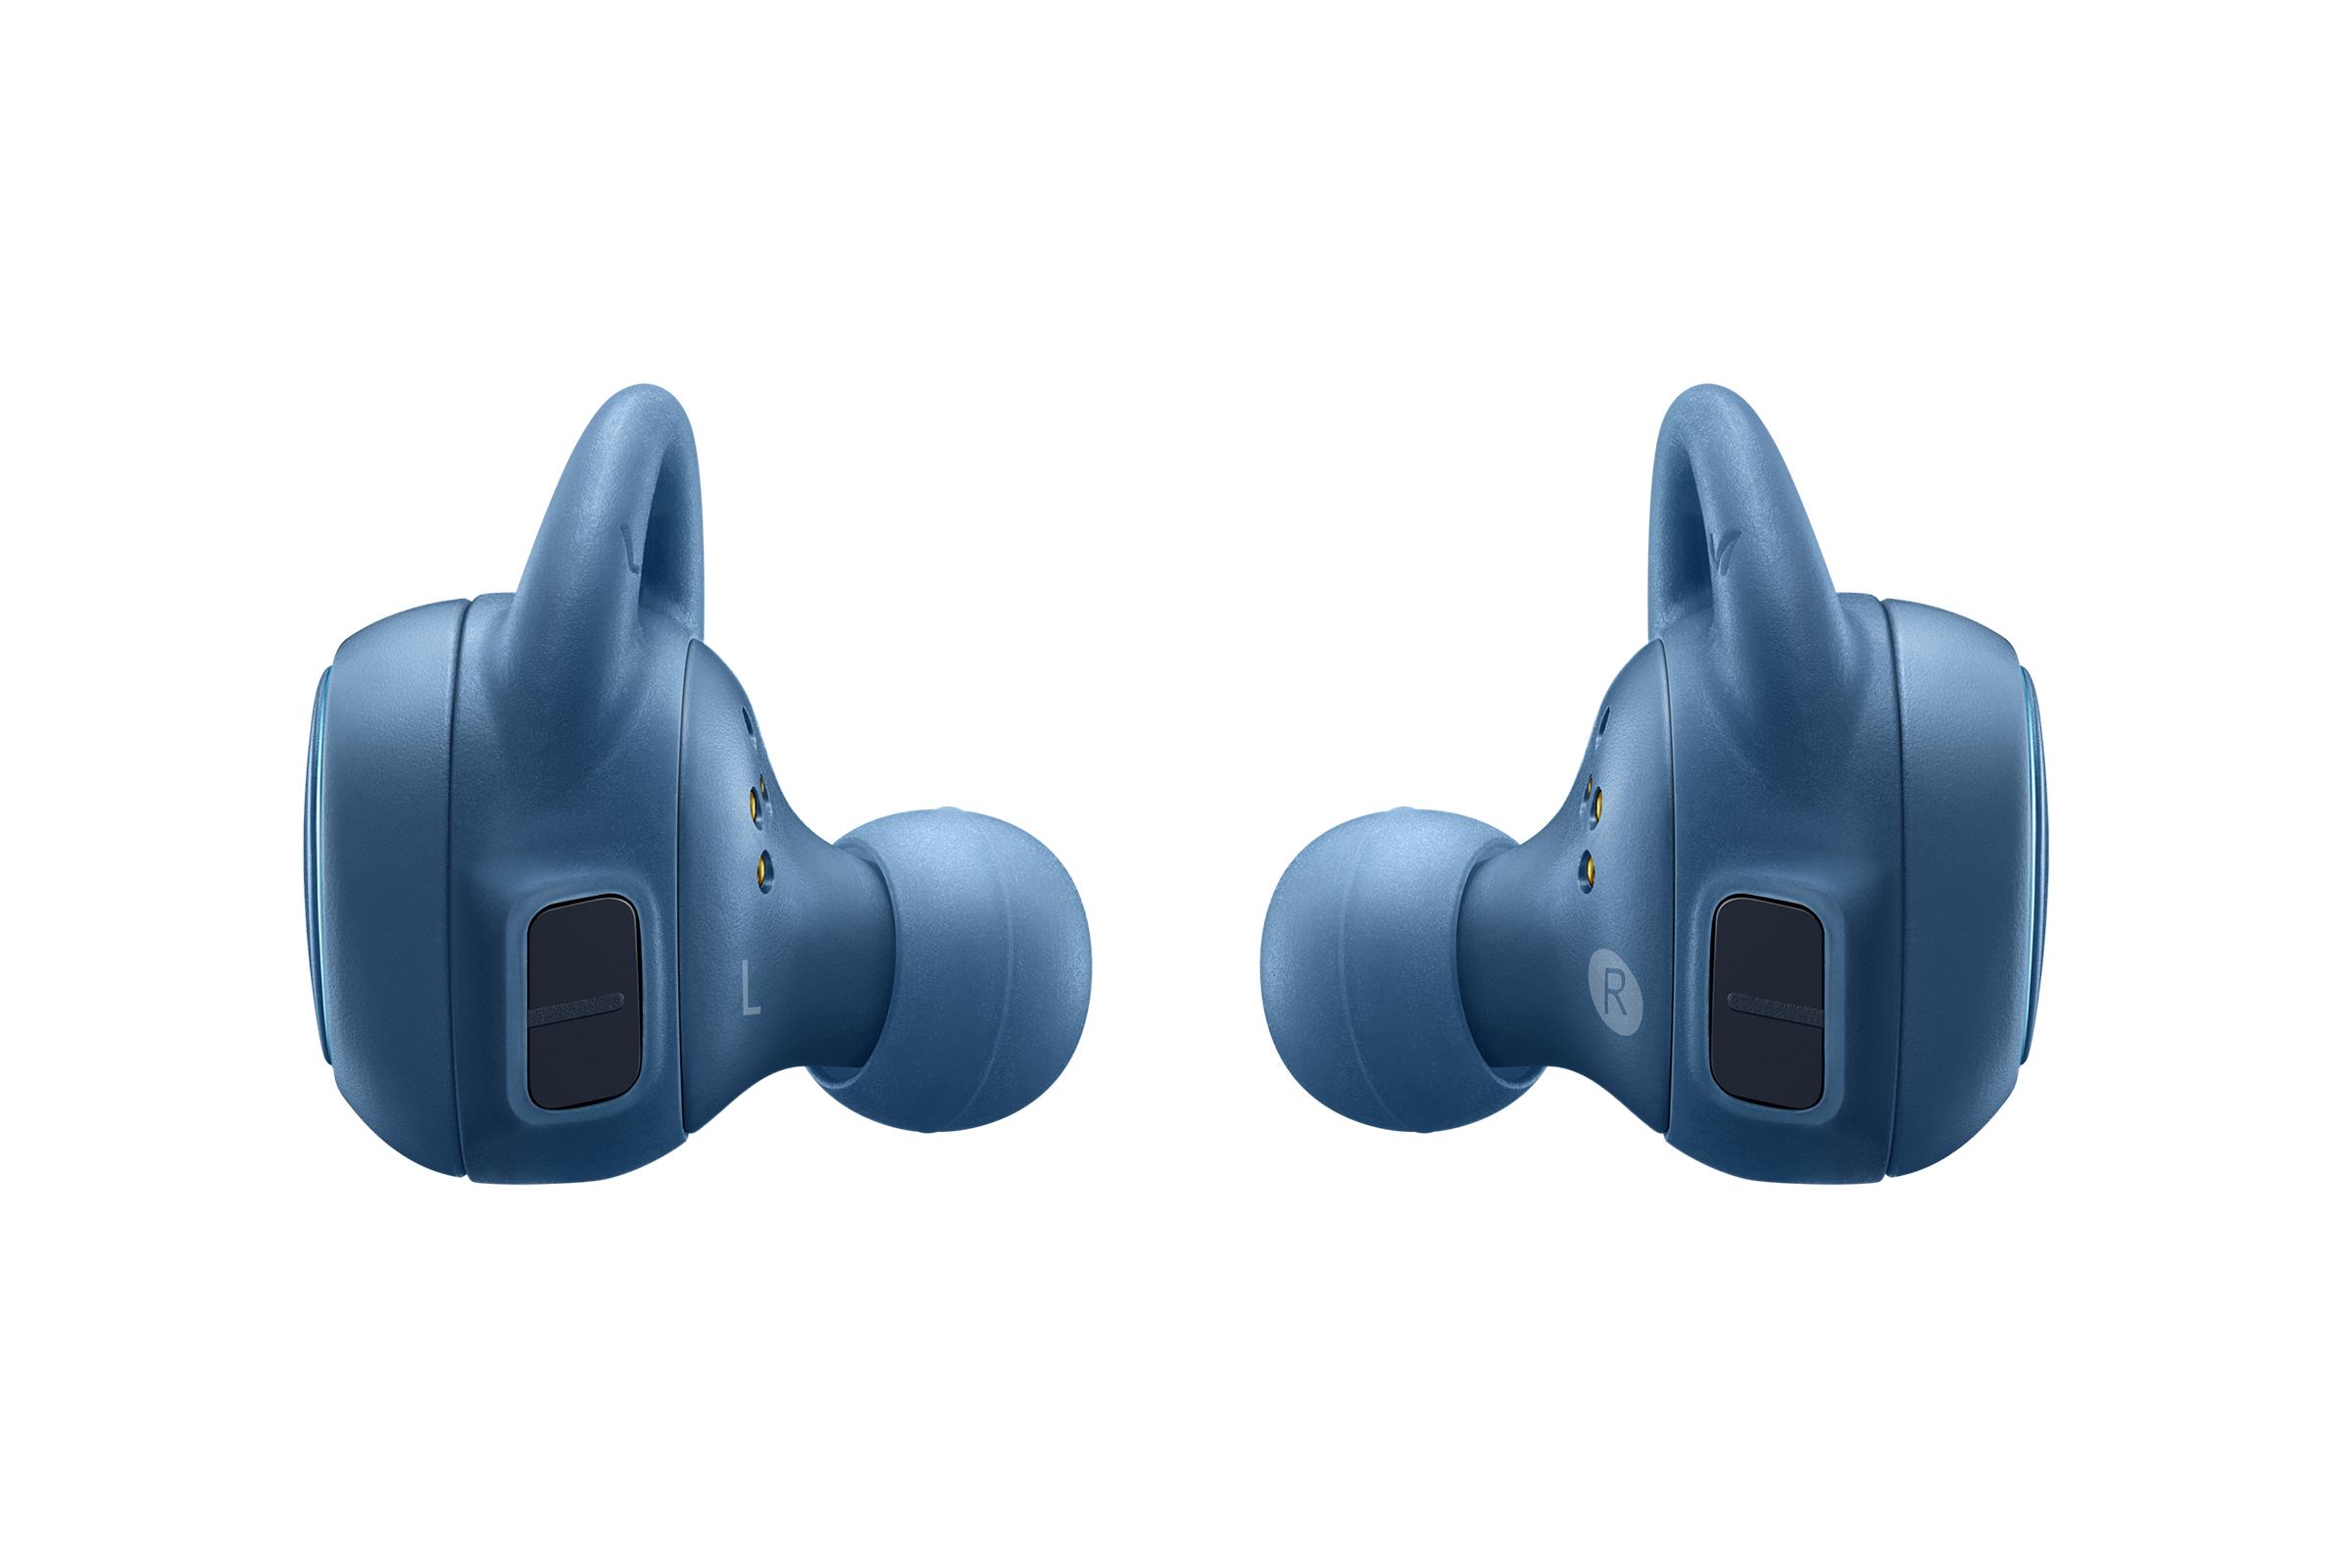 Image Result For Samsung Gear Fit Wallpaper